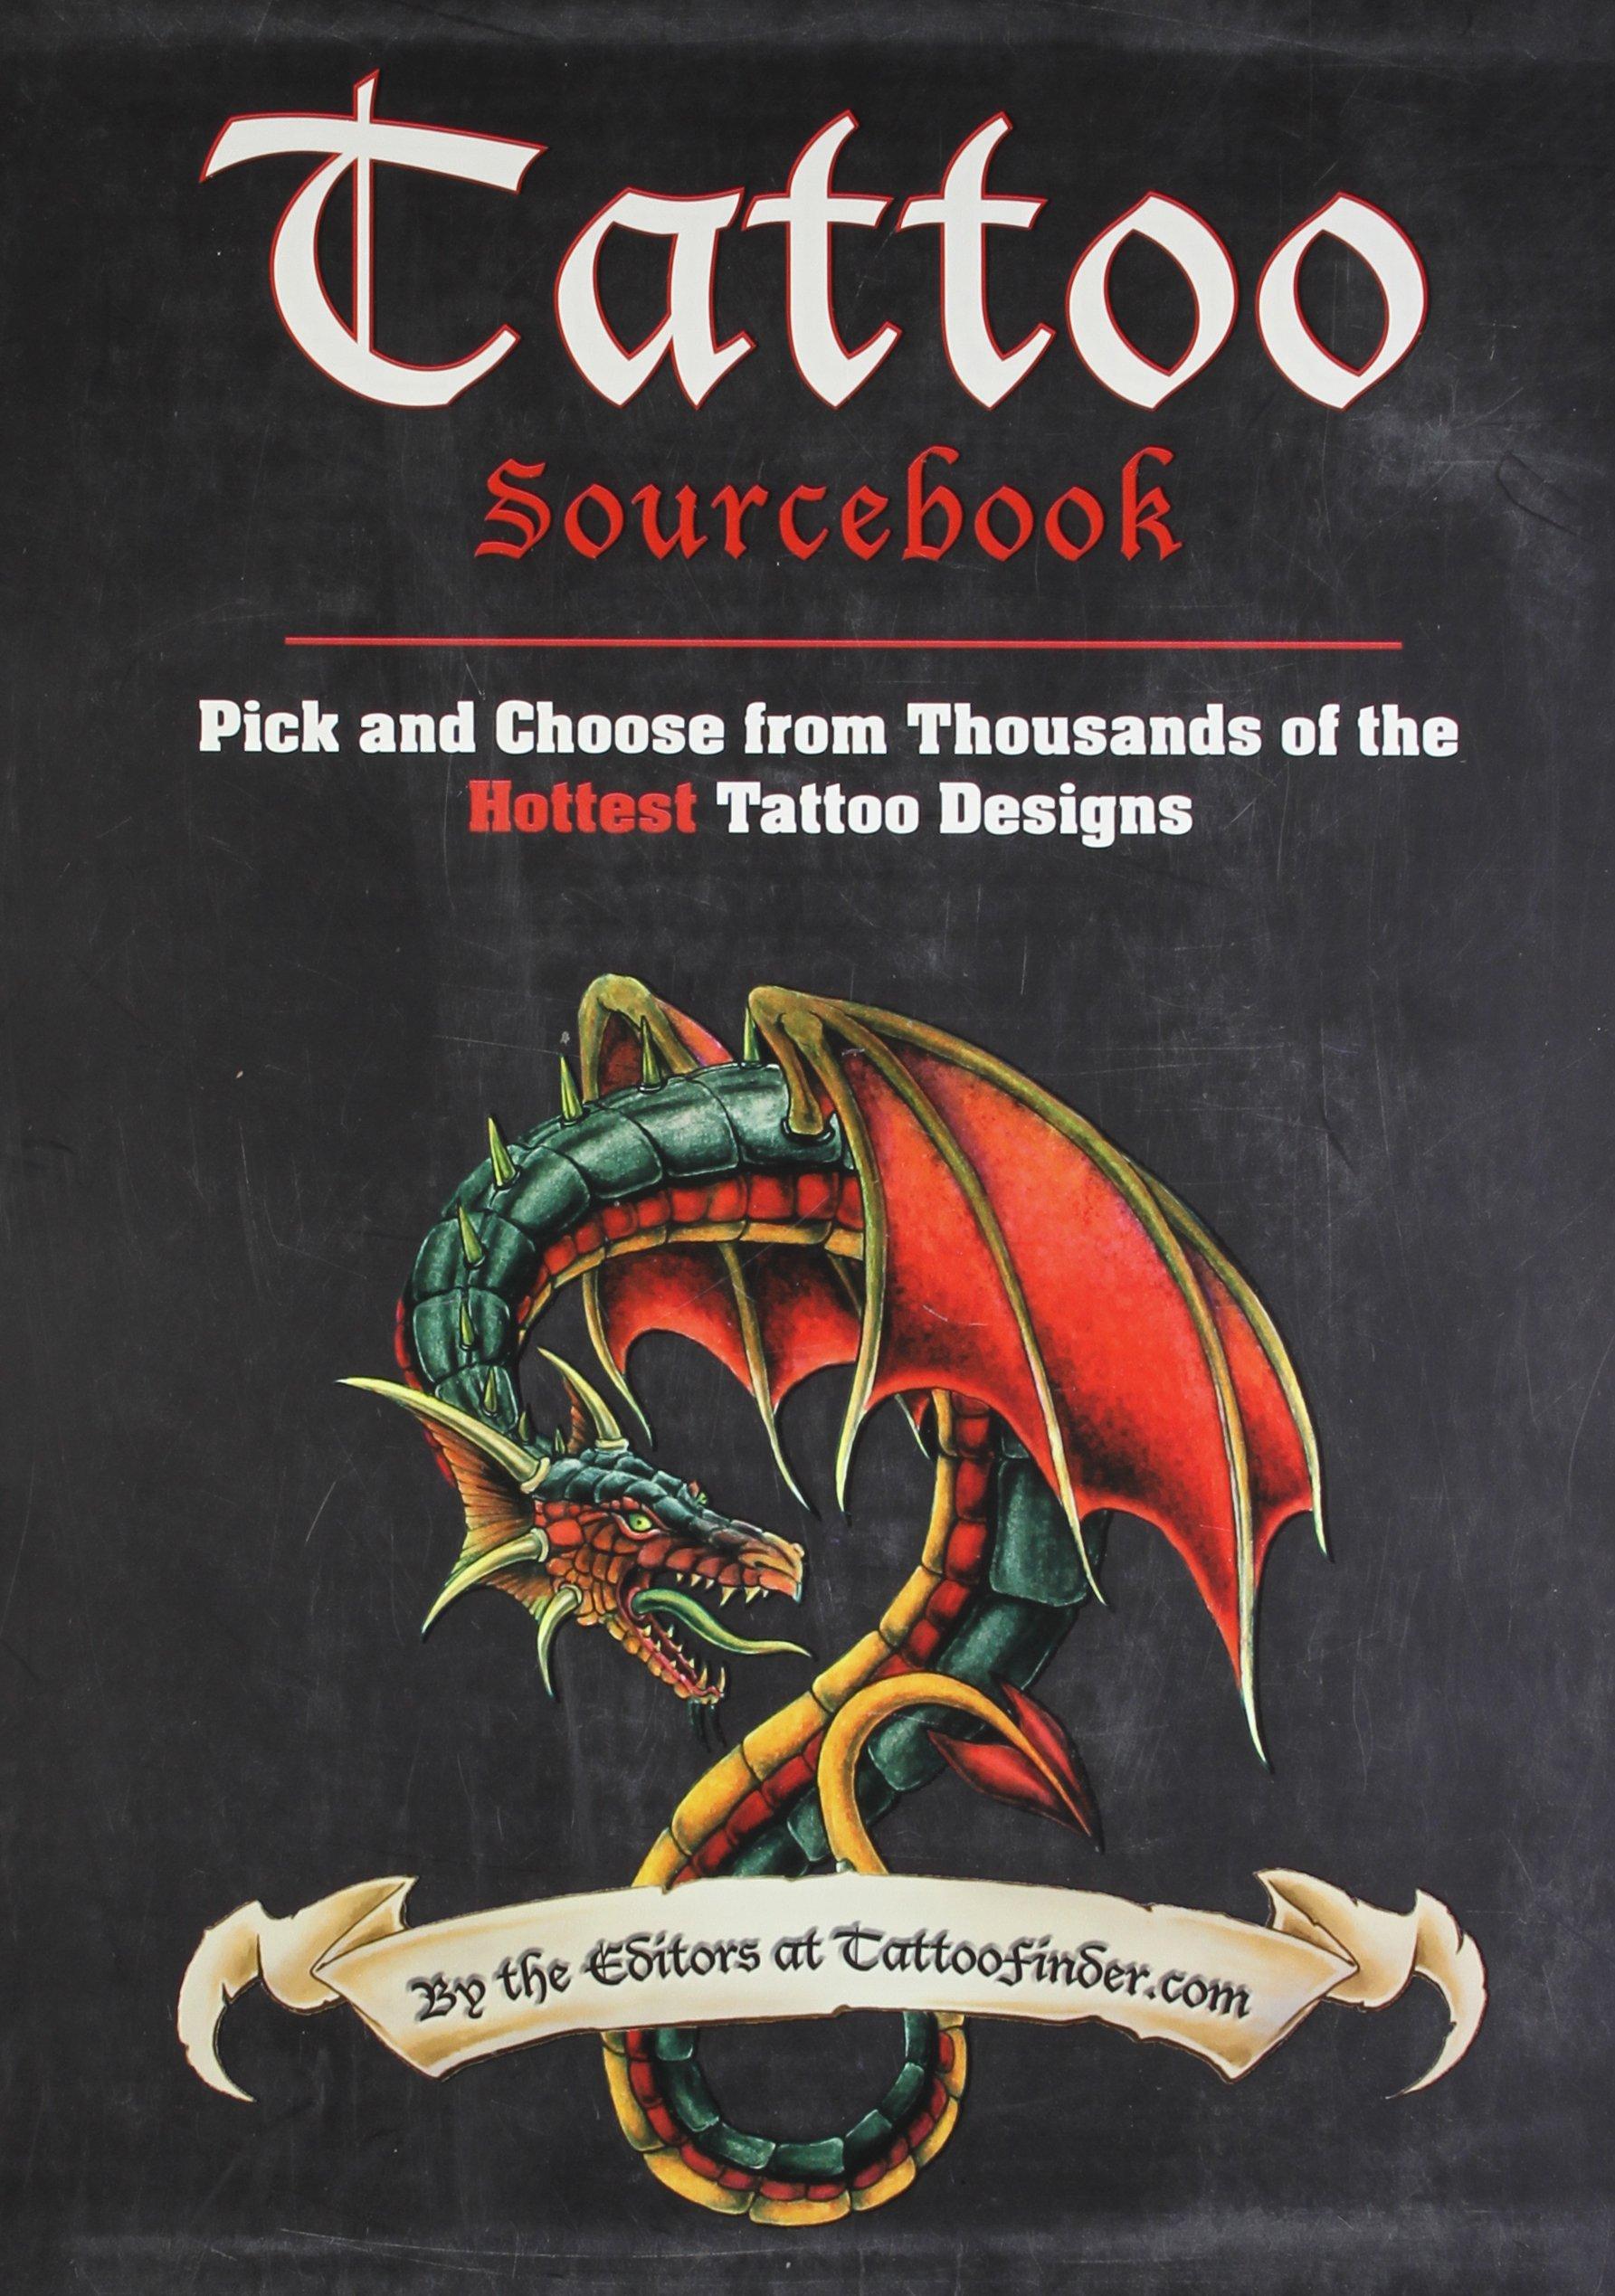 Tattoo Sourcebook Tattoofinder product image